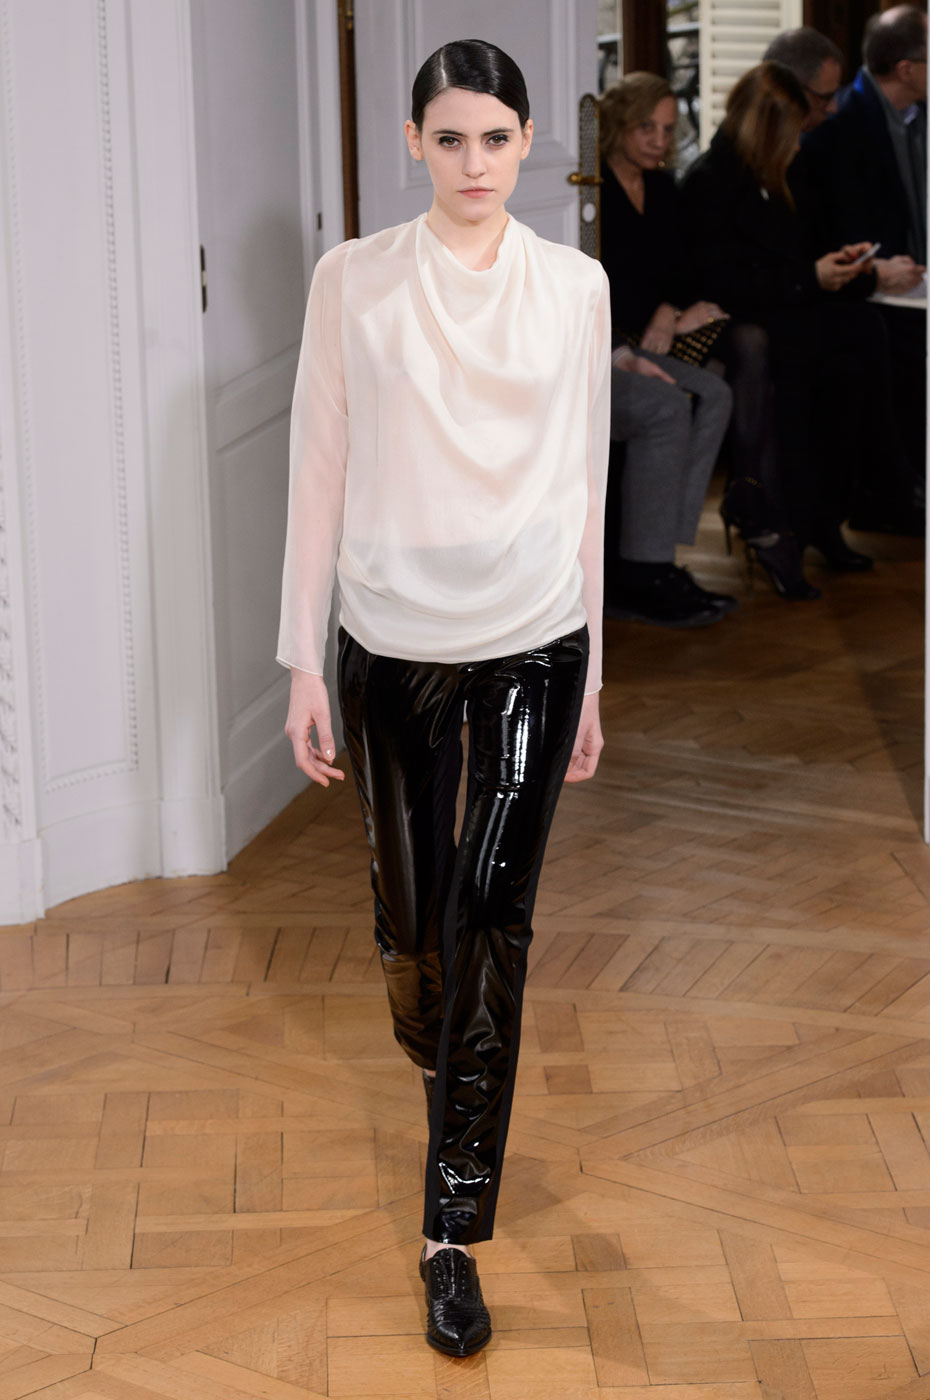 Bouchra-Jarrar-fashion-runway-show-haute-couture-paris-spring-summer-2015-the-impression-47